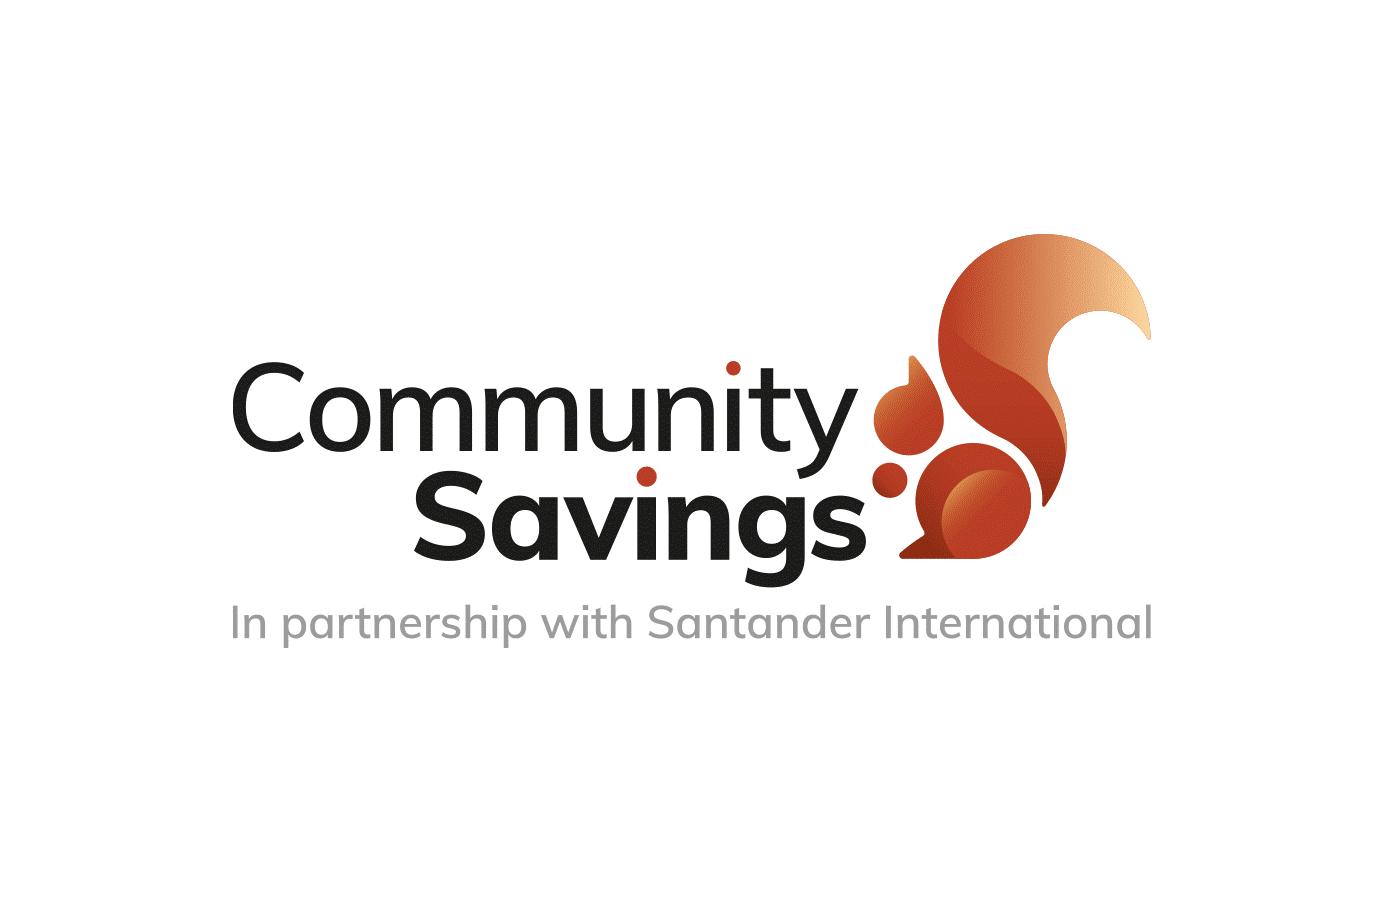 Community Savings Limited